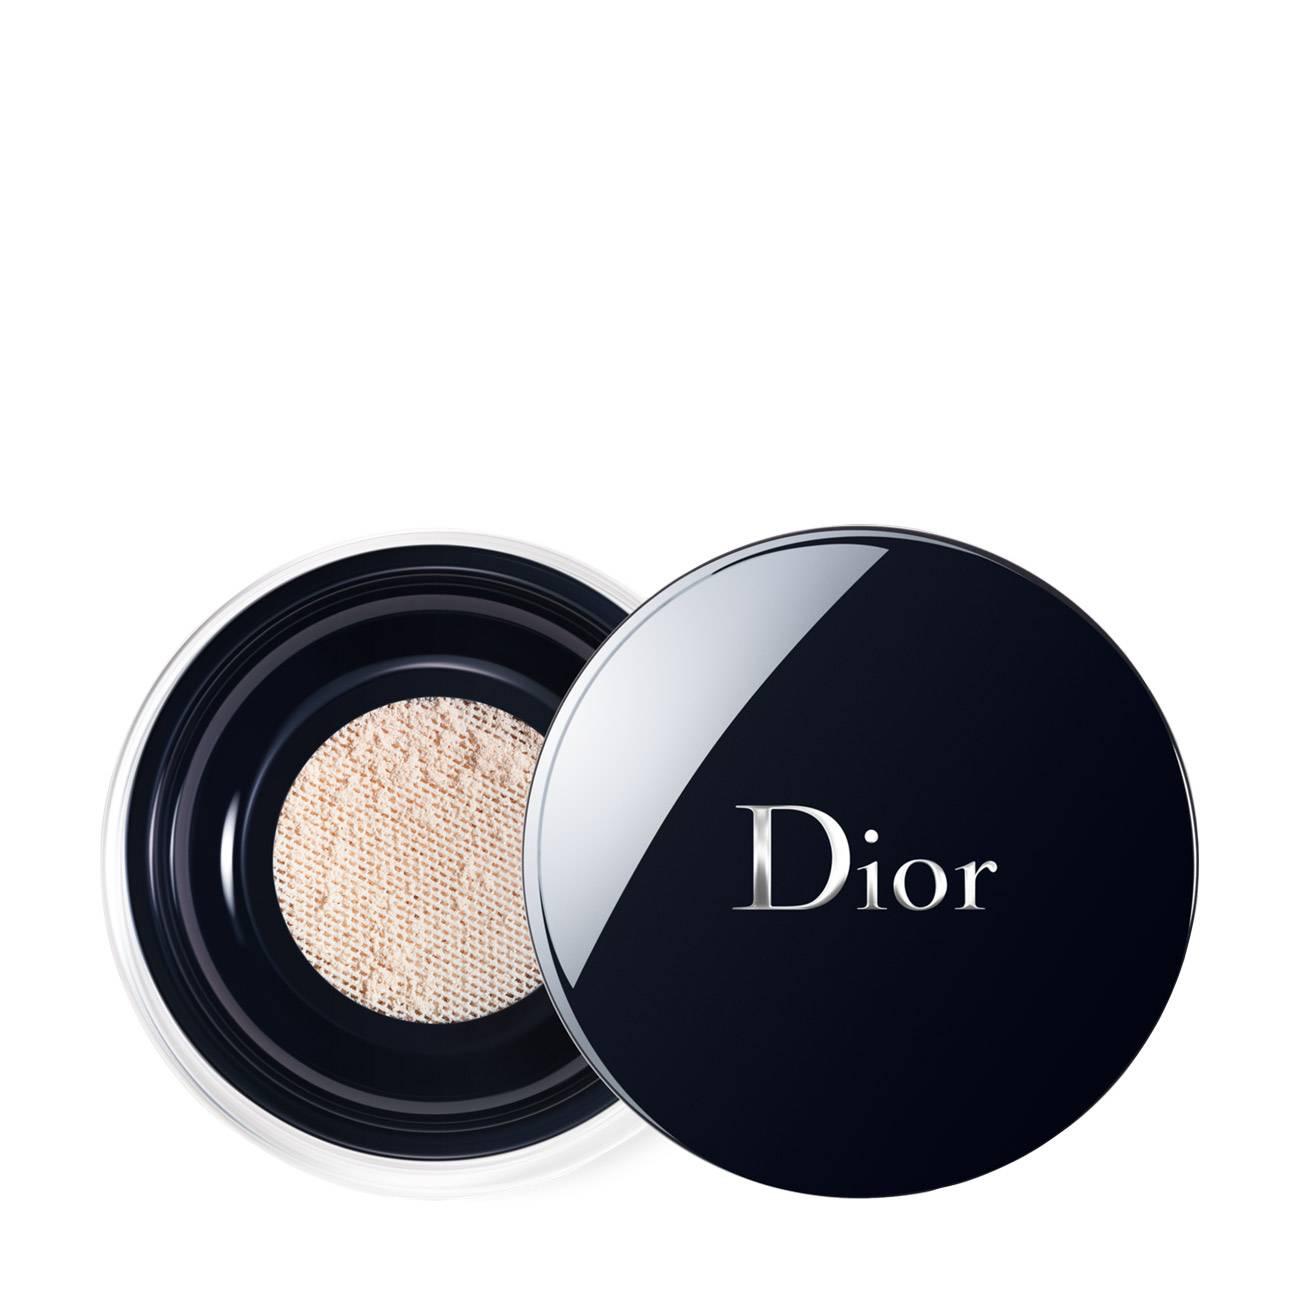 Forever Loose Powder 8 Grame Dior imagine 2021 bestvalue.eu